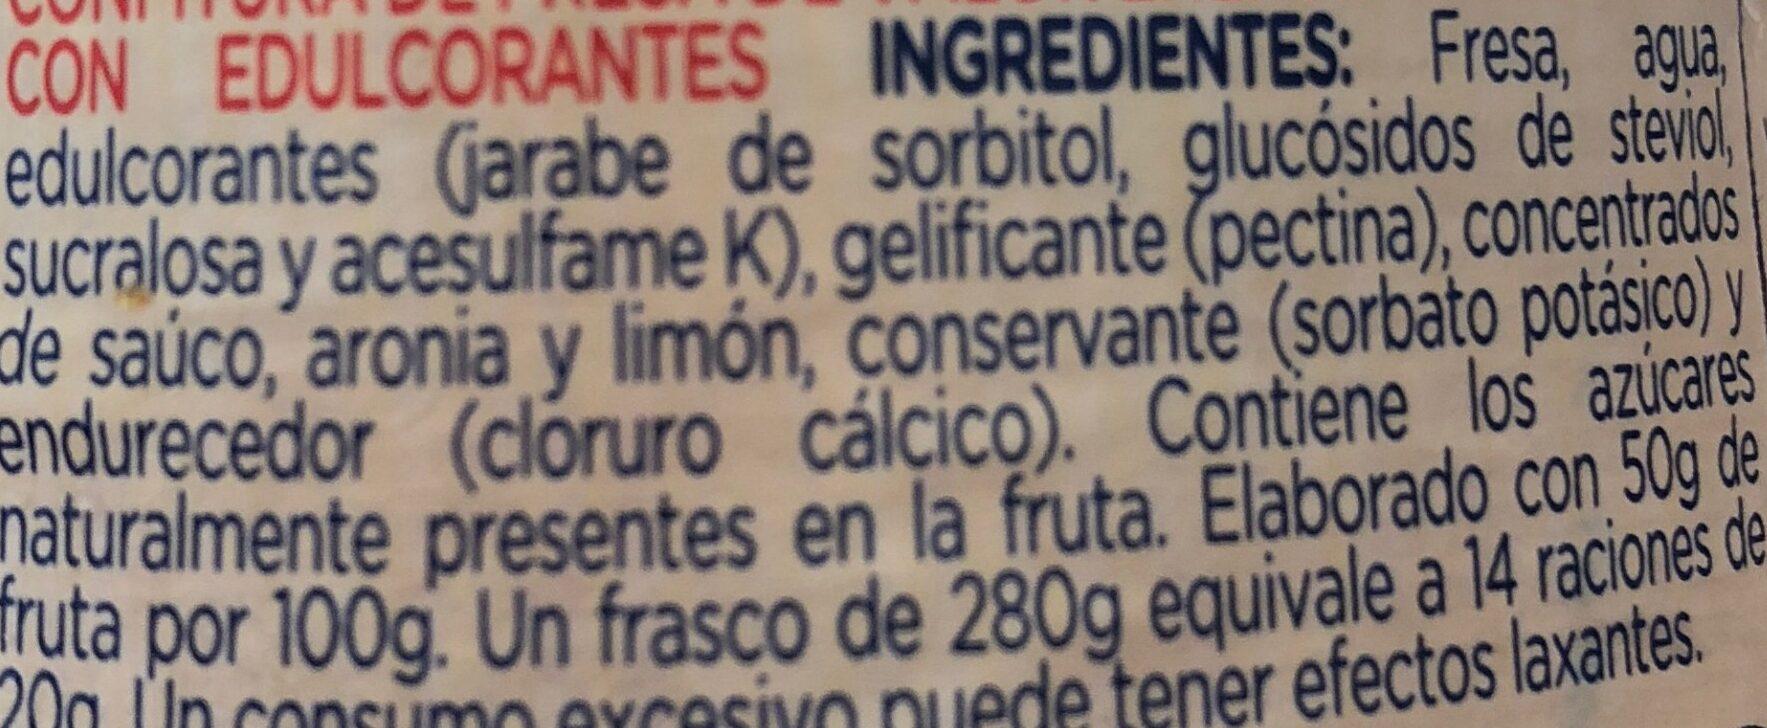 Mermelada de fresa - Ingredients - es